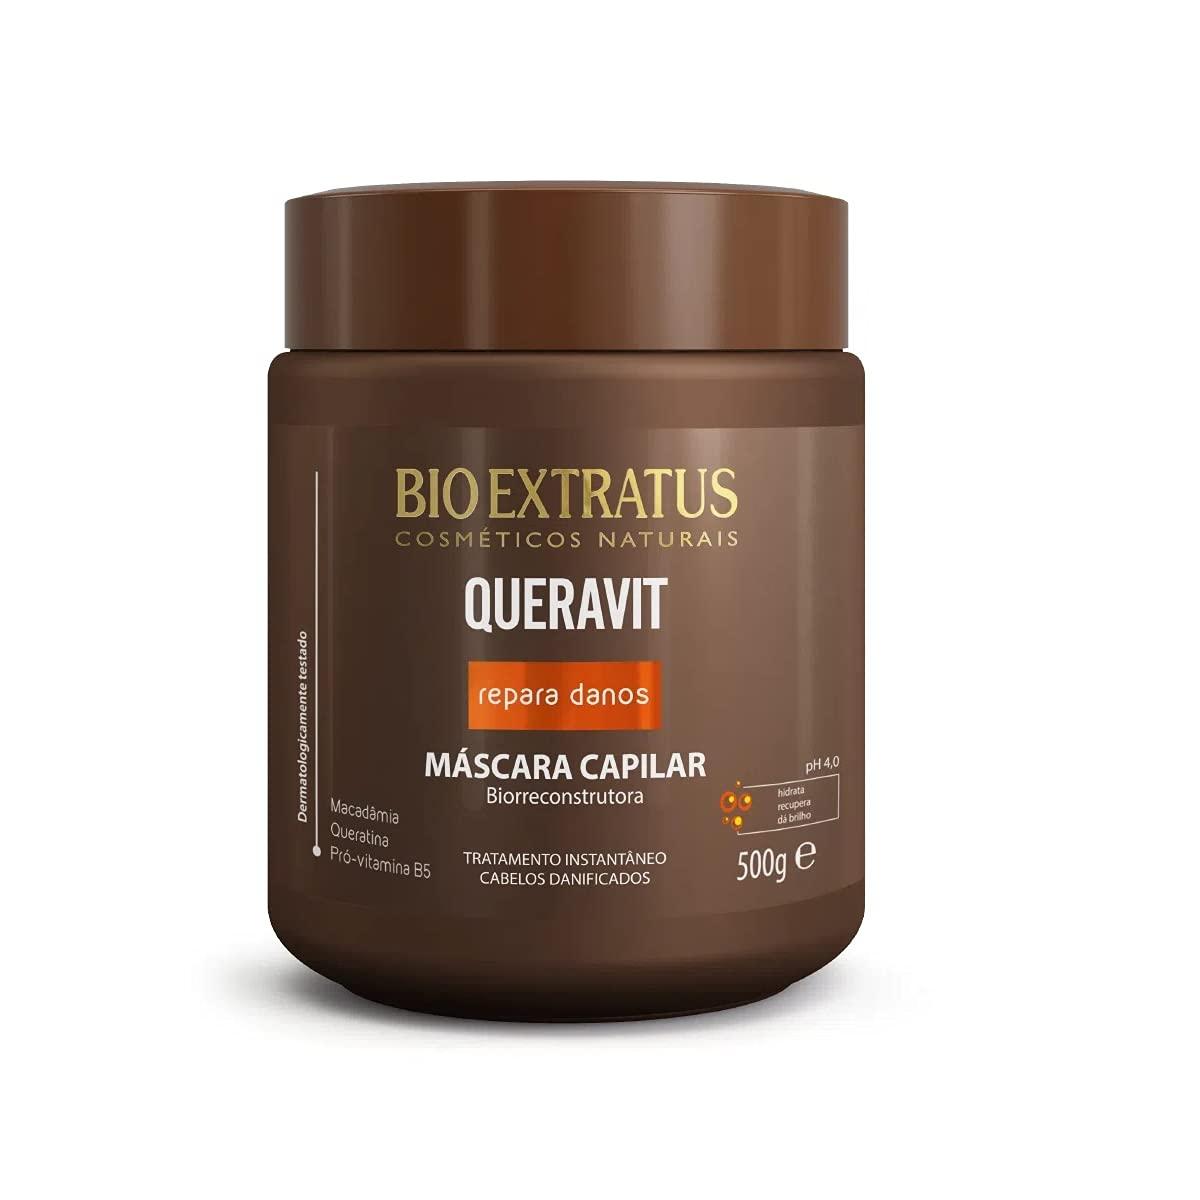 Linha Queravit Tratamento San Antonio Mall Instantaneo Special price Bio C Extratus Mascara -